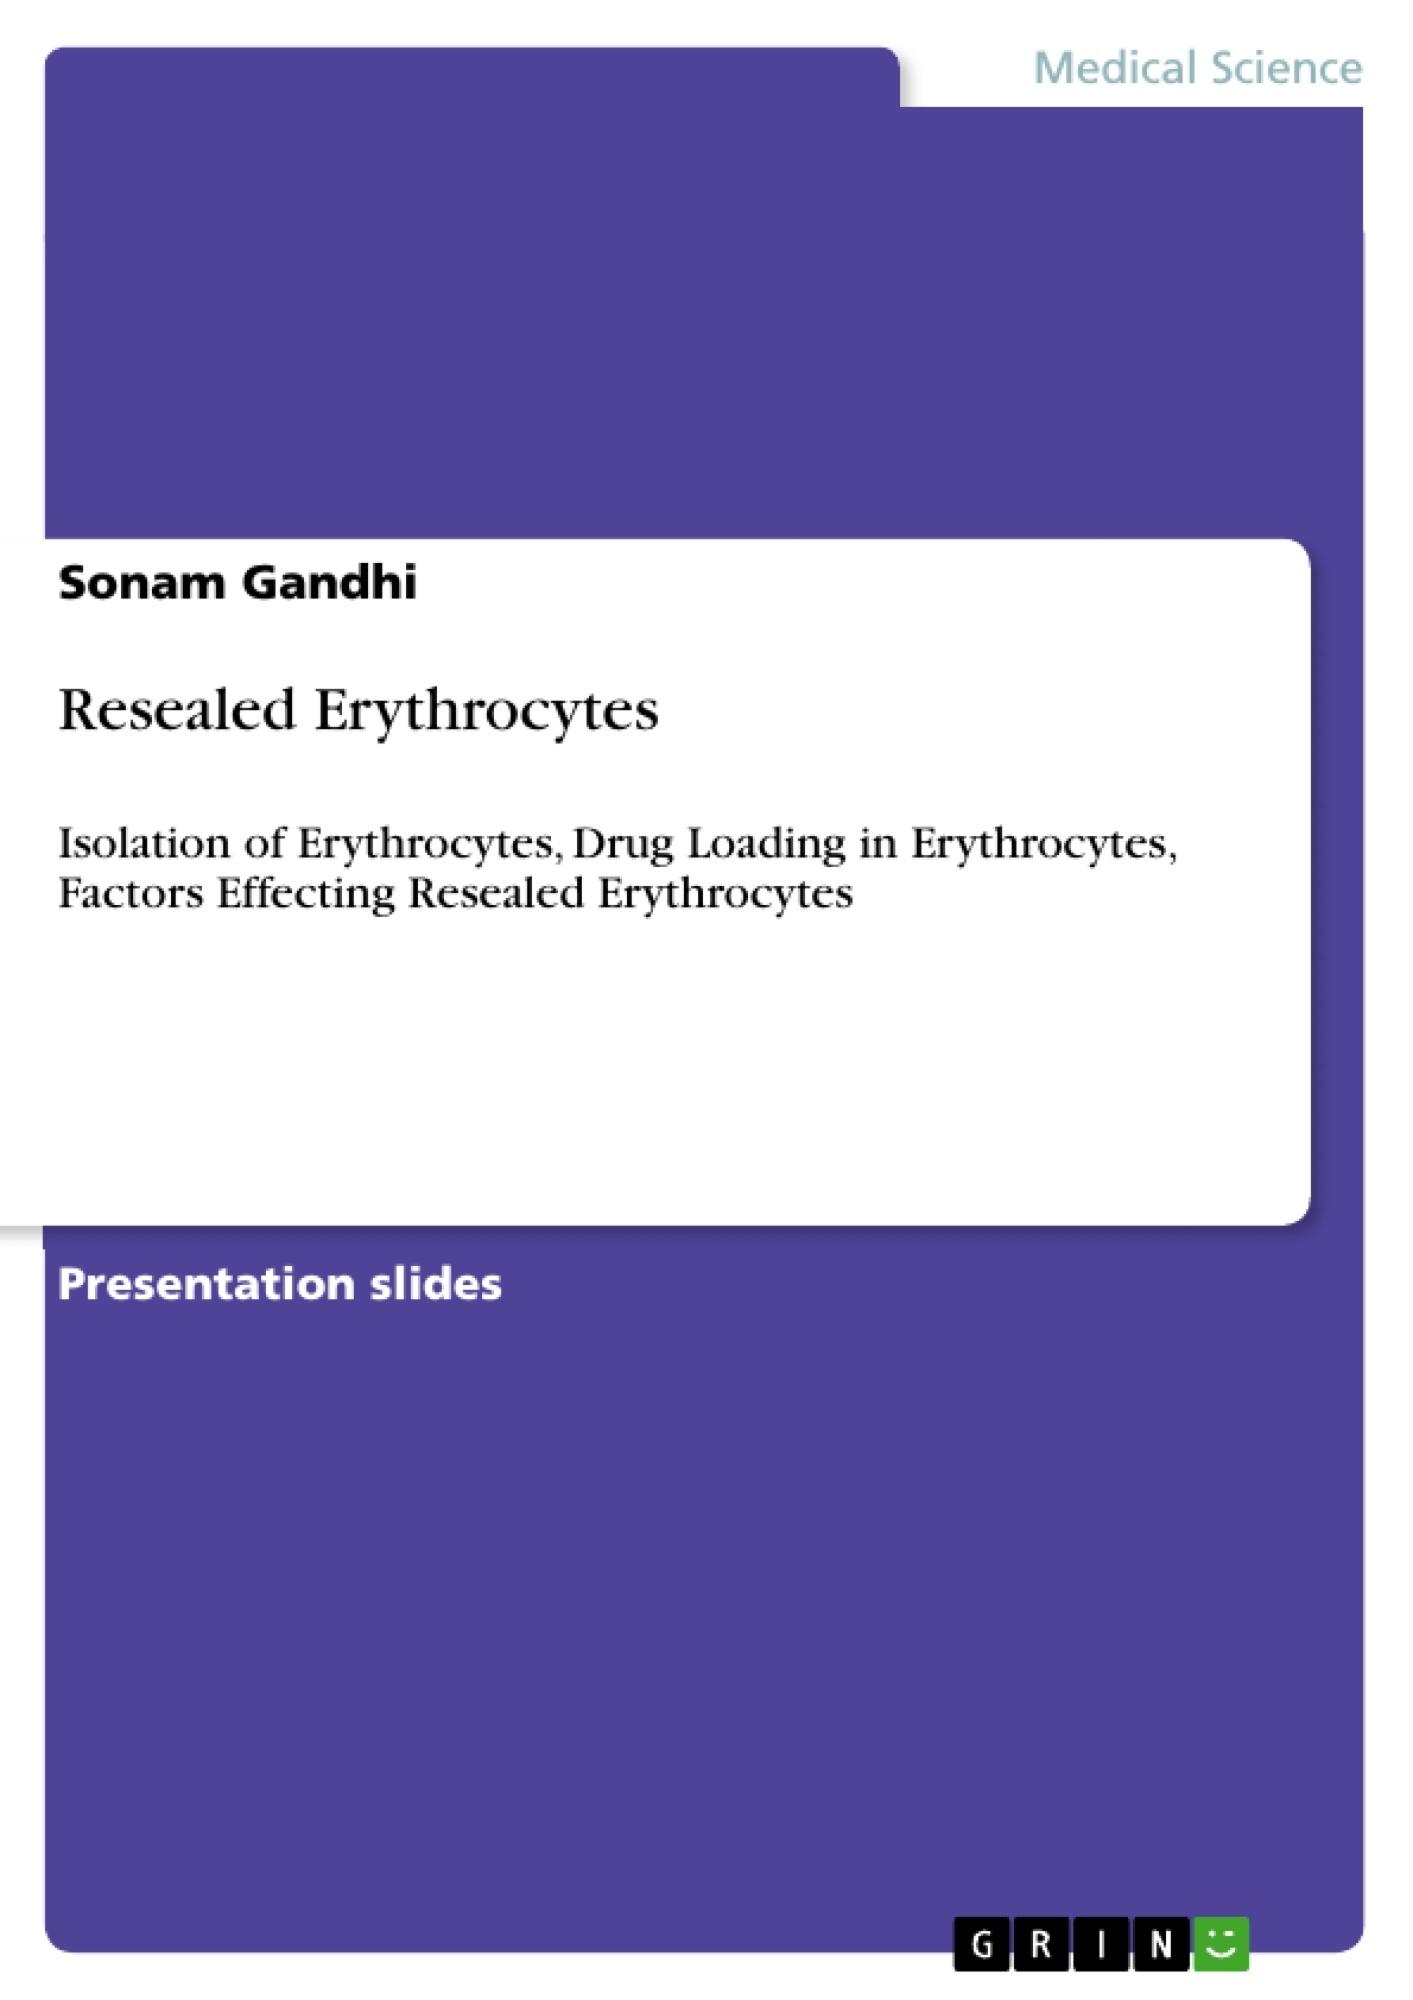 Title: Resealed Erythrocytes